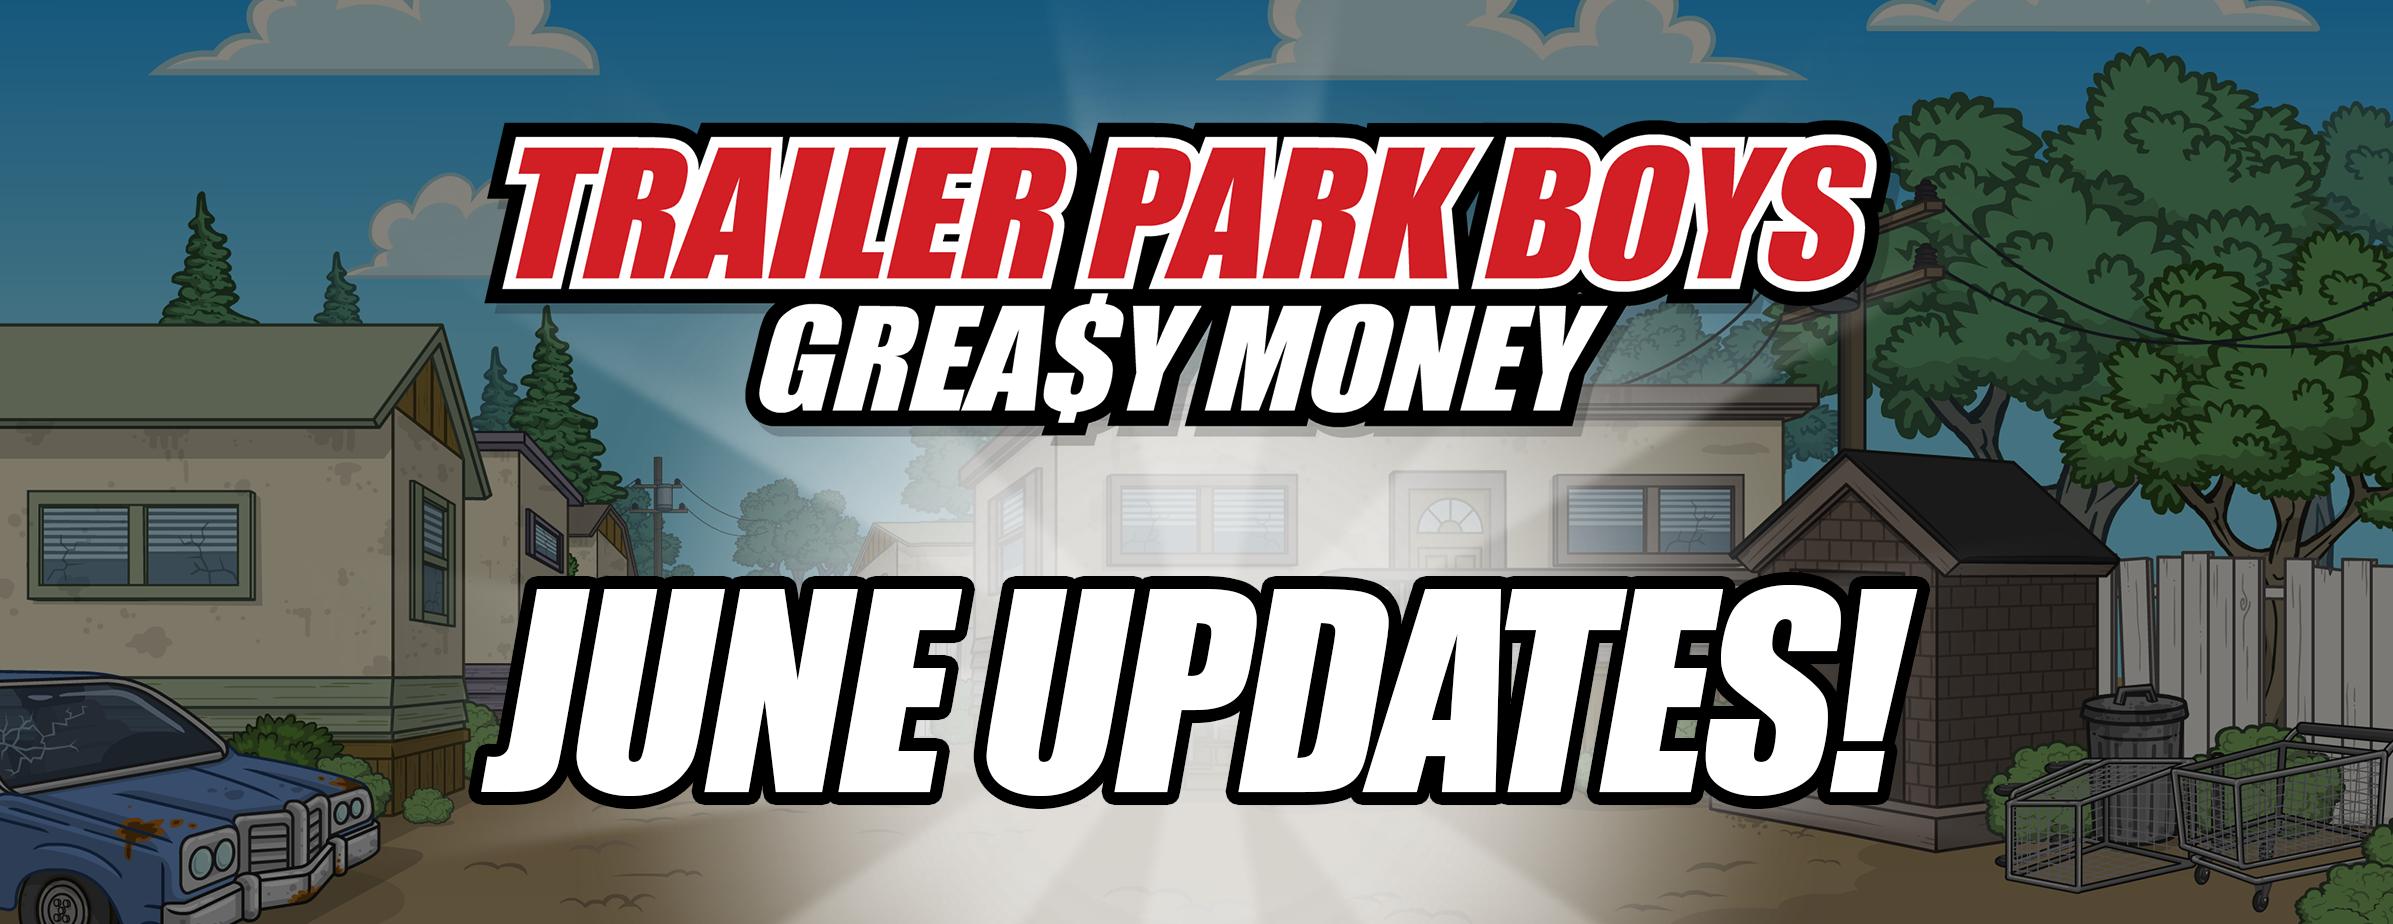 Trailer Park Boys: Greasy June Events!